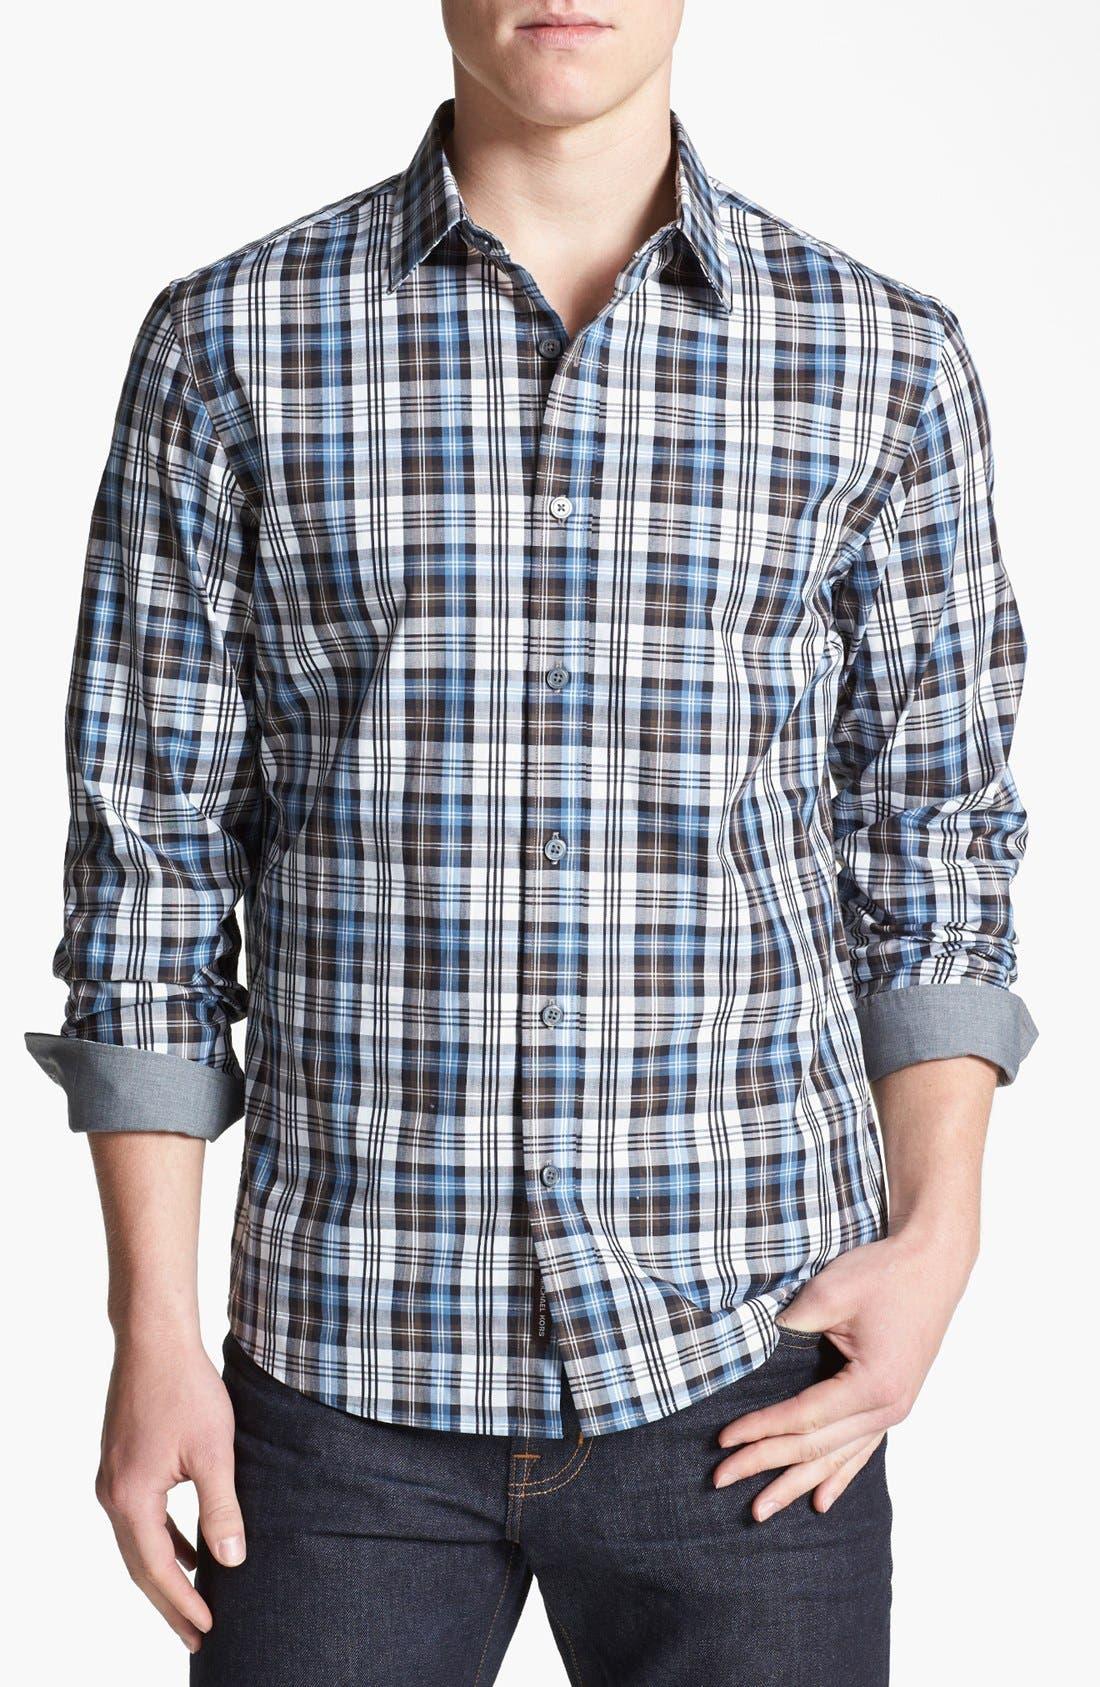 Main Image - Michael Kors 'Crispin Check' Regular Fit Sport Shirt